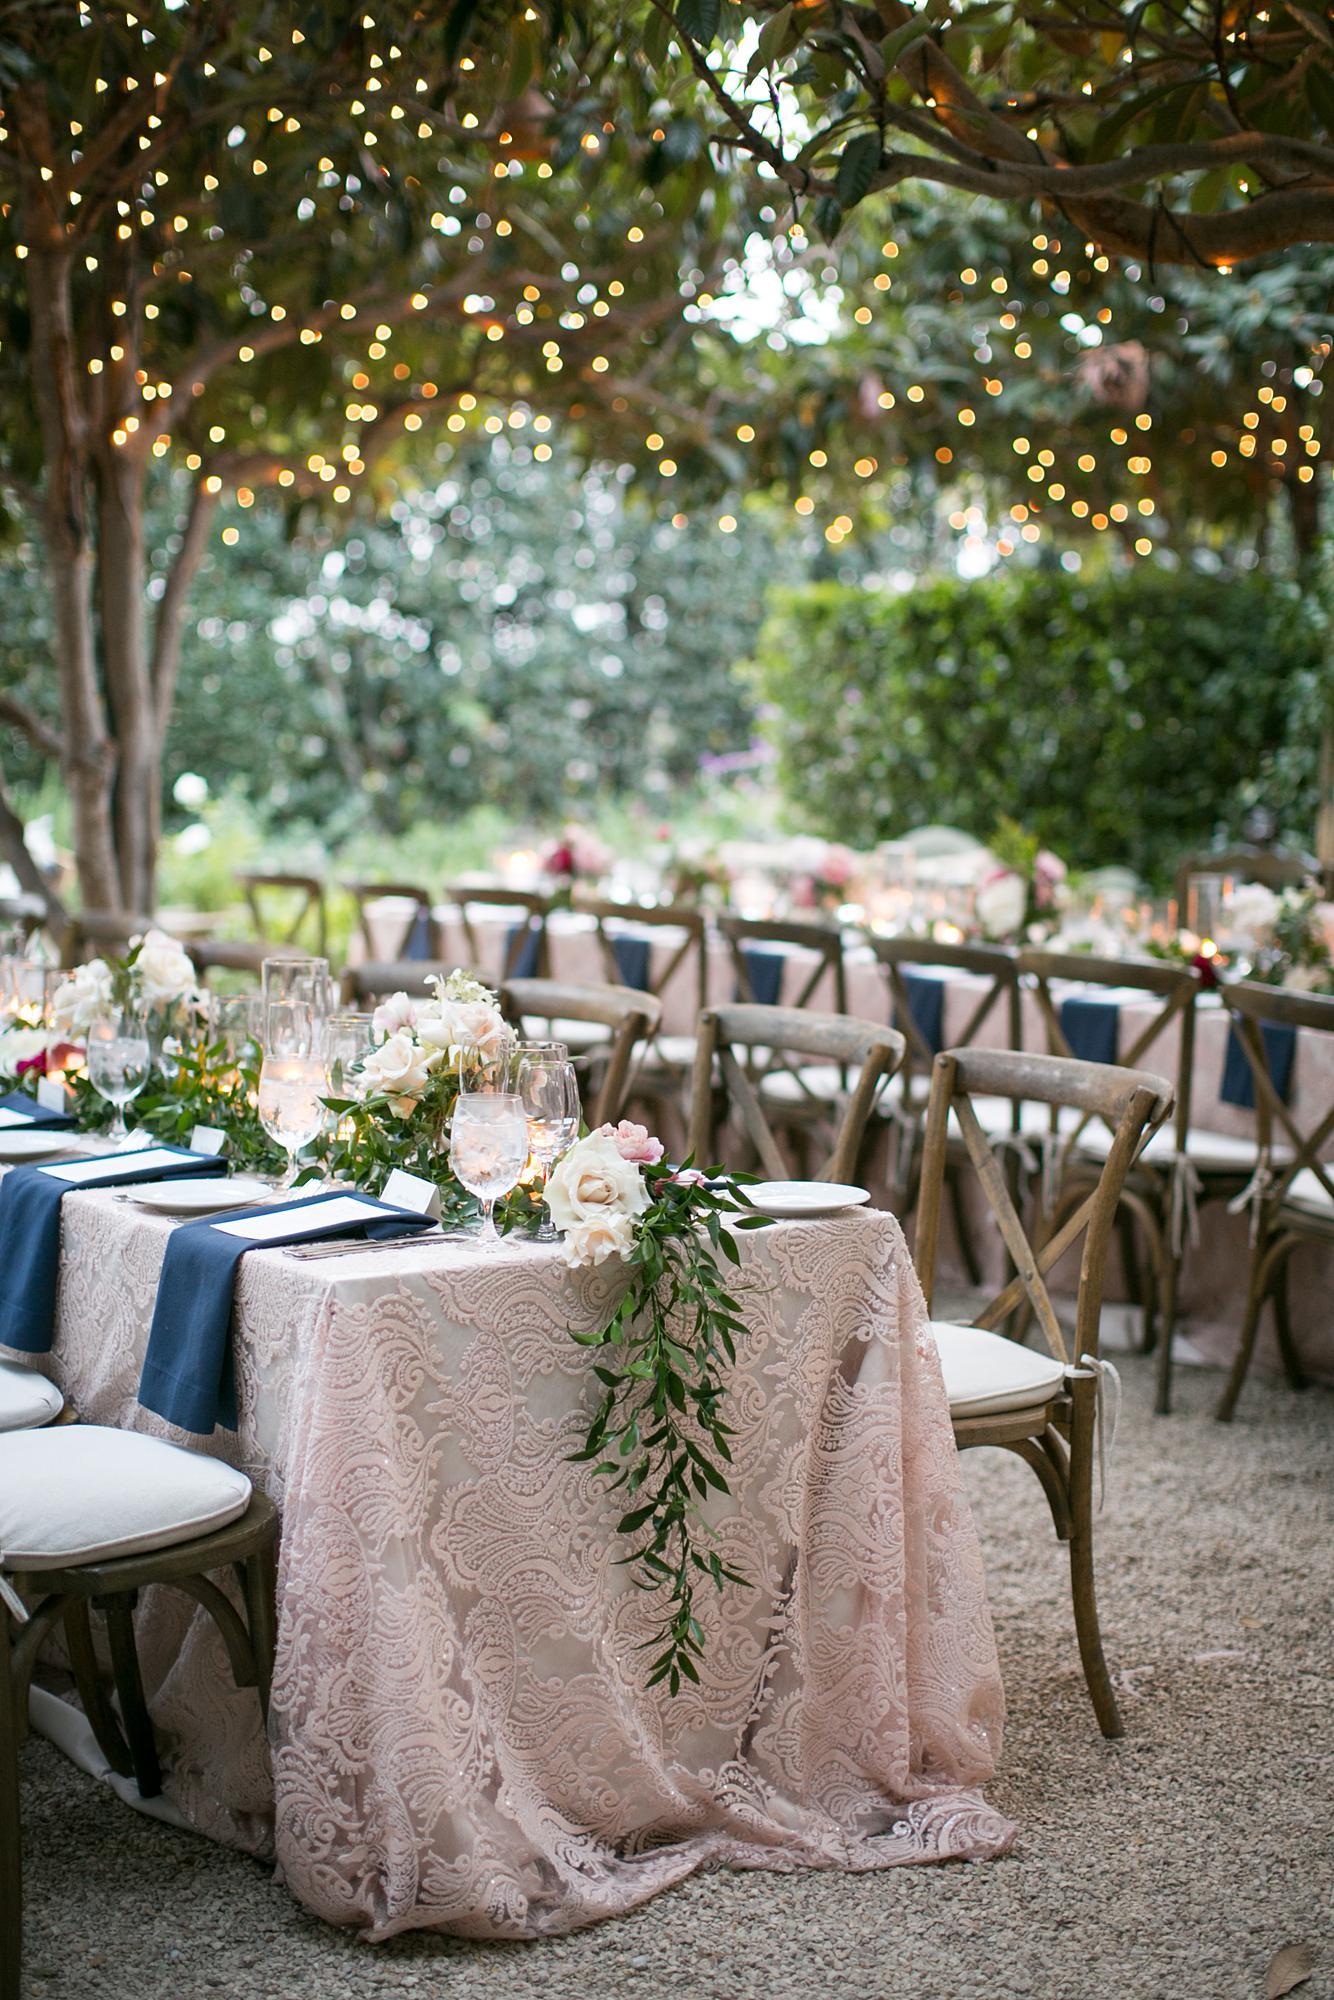 San Yisidro Ranch Wedding | Miki & Sonja Photography | mikiandsonja.com